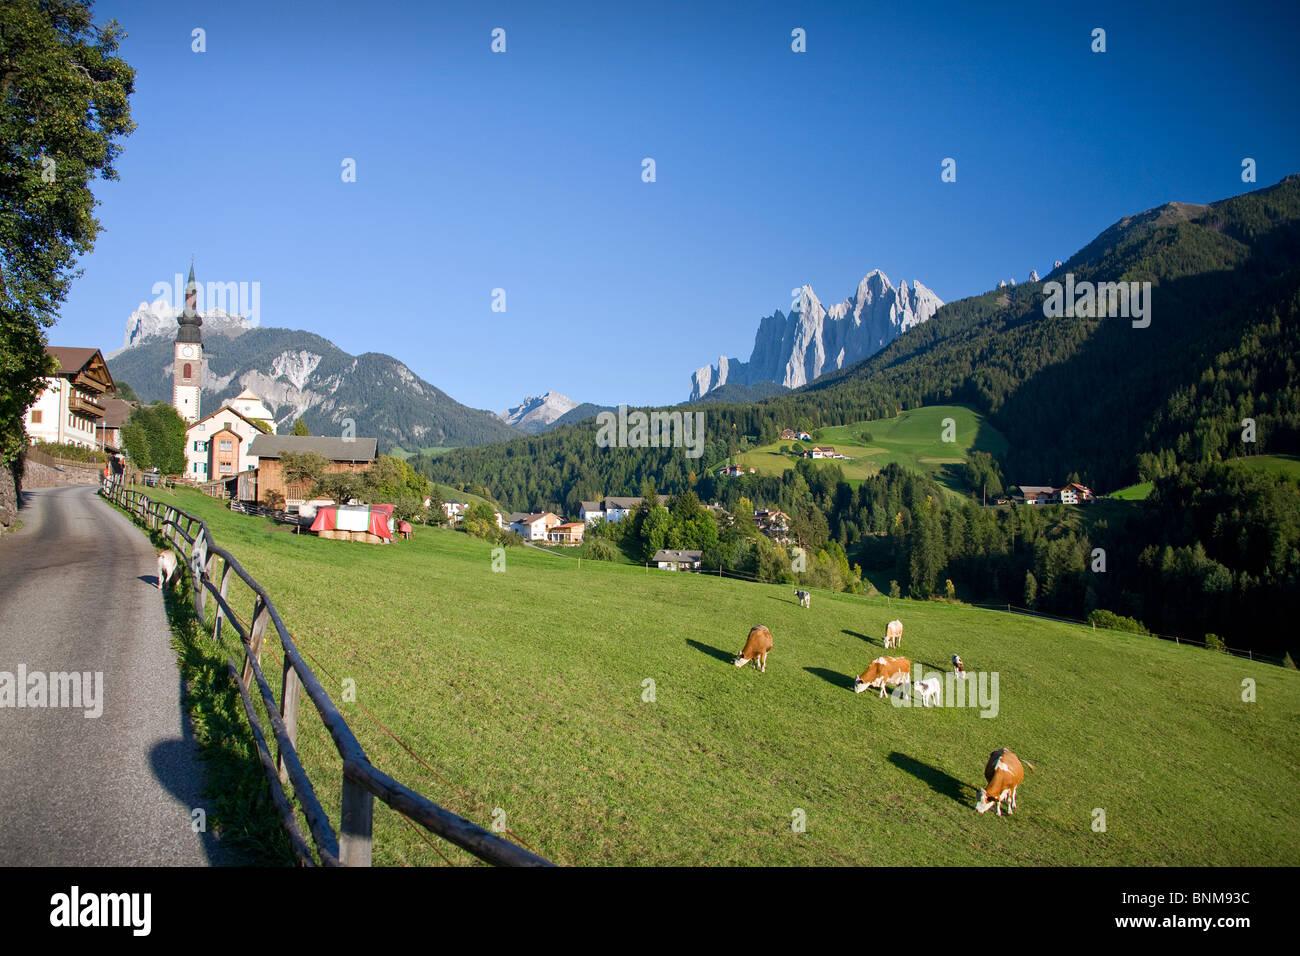 Italia Dolomitas Alpes montañas Villnöss divertido bosque madera meadows vacas holidays travel, Imagen De Stock